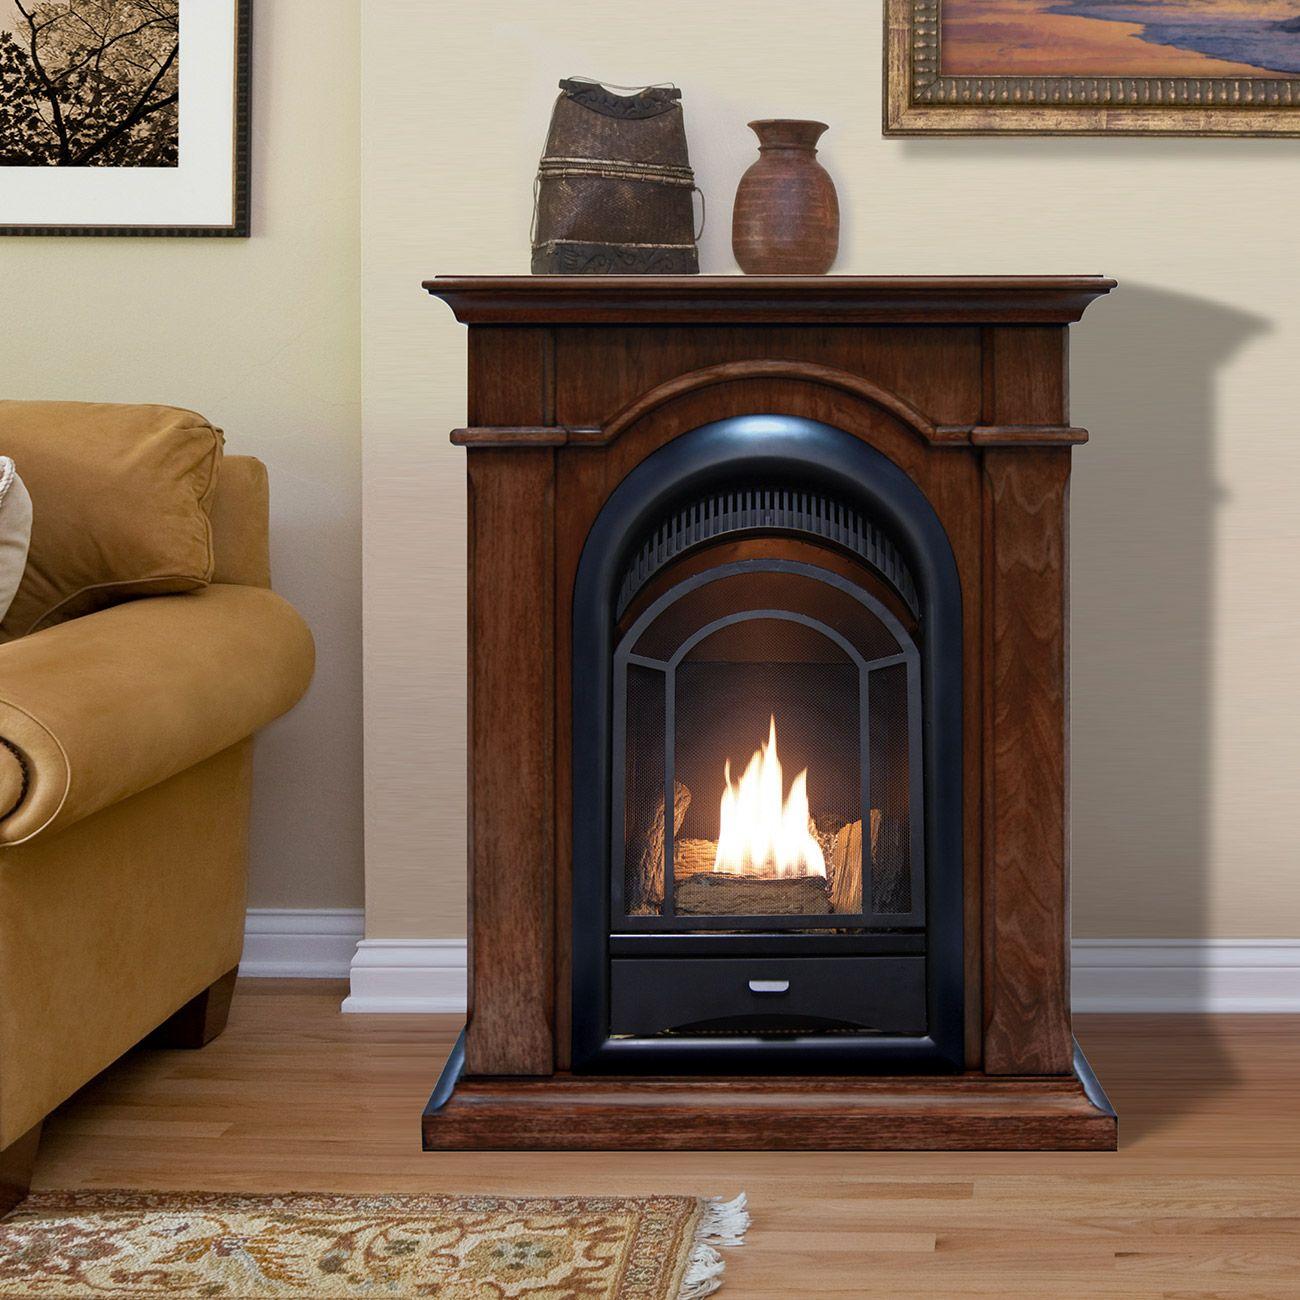 Ventless Fireplace System Corner Combo Dual Fuel Walnut Finish 15 000 Btu In 2020 Propane Fireplace Indoor Gas Fireplace Portable Fireplace